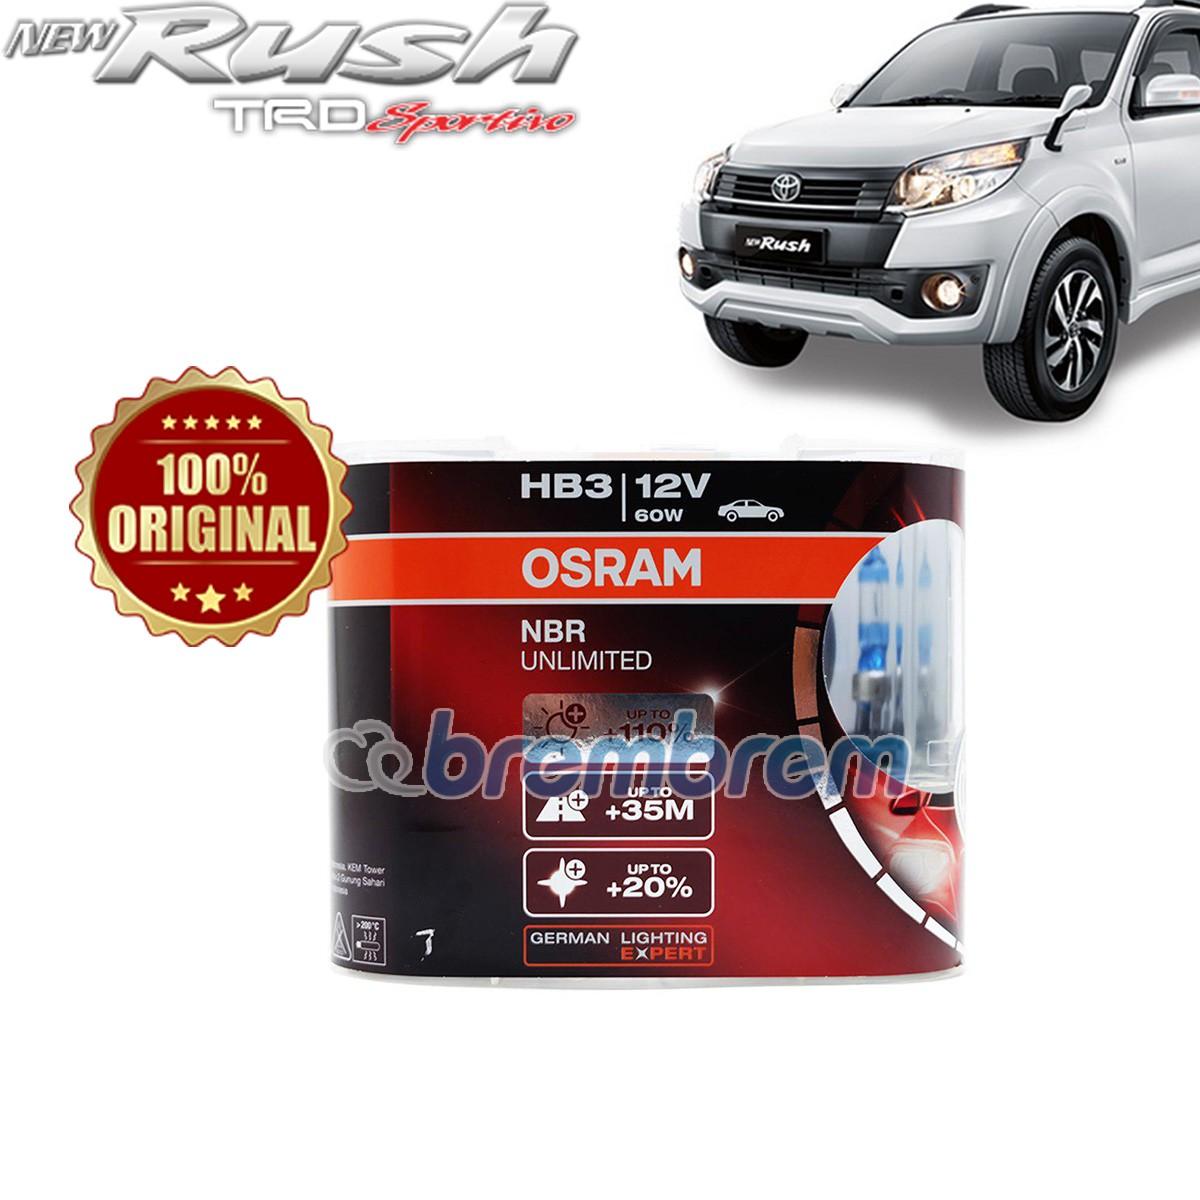 OSRAM NIGHT BREAKER UNLIMITED HB3 - LAMPU HALOGEN TOYOTA RUSH